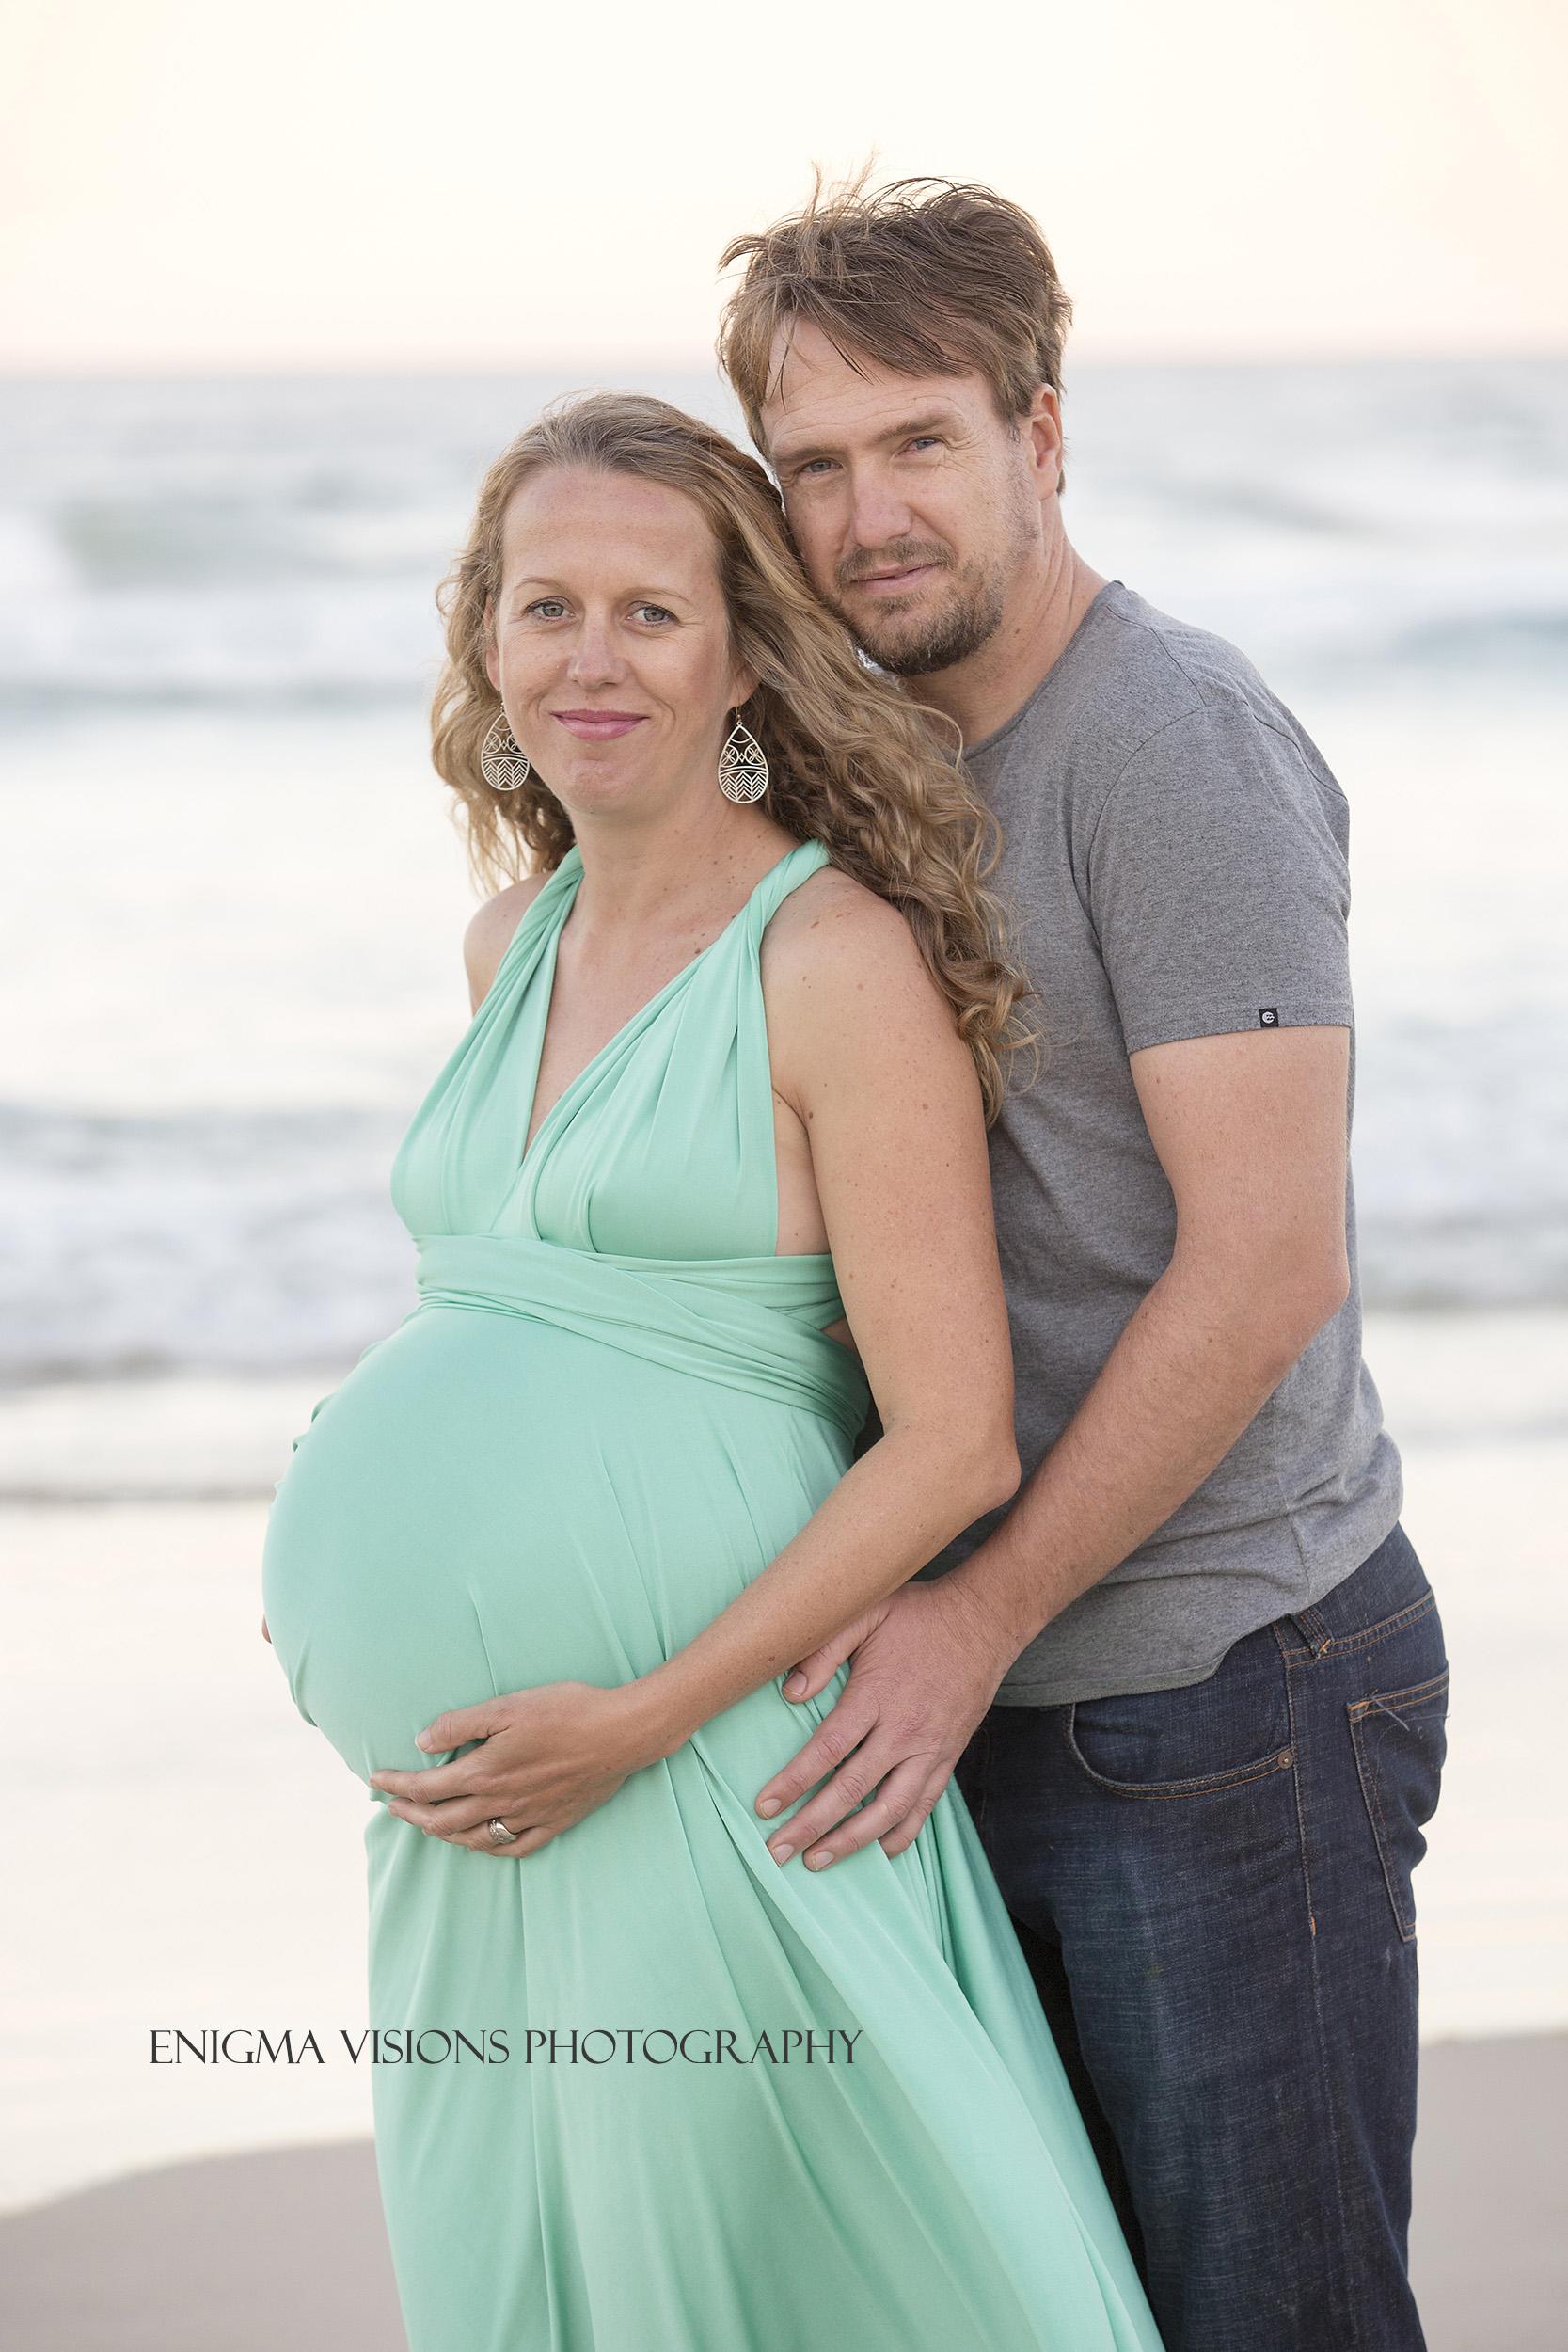 enigma_visions_photography_maternity_melandandrew_kingscliff (45).jpg